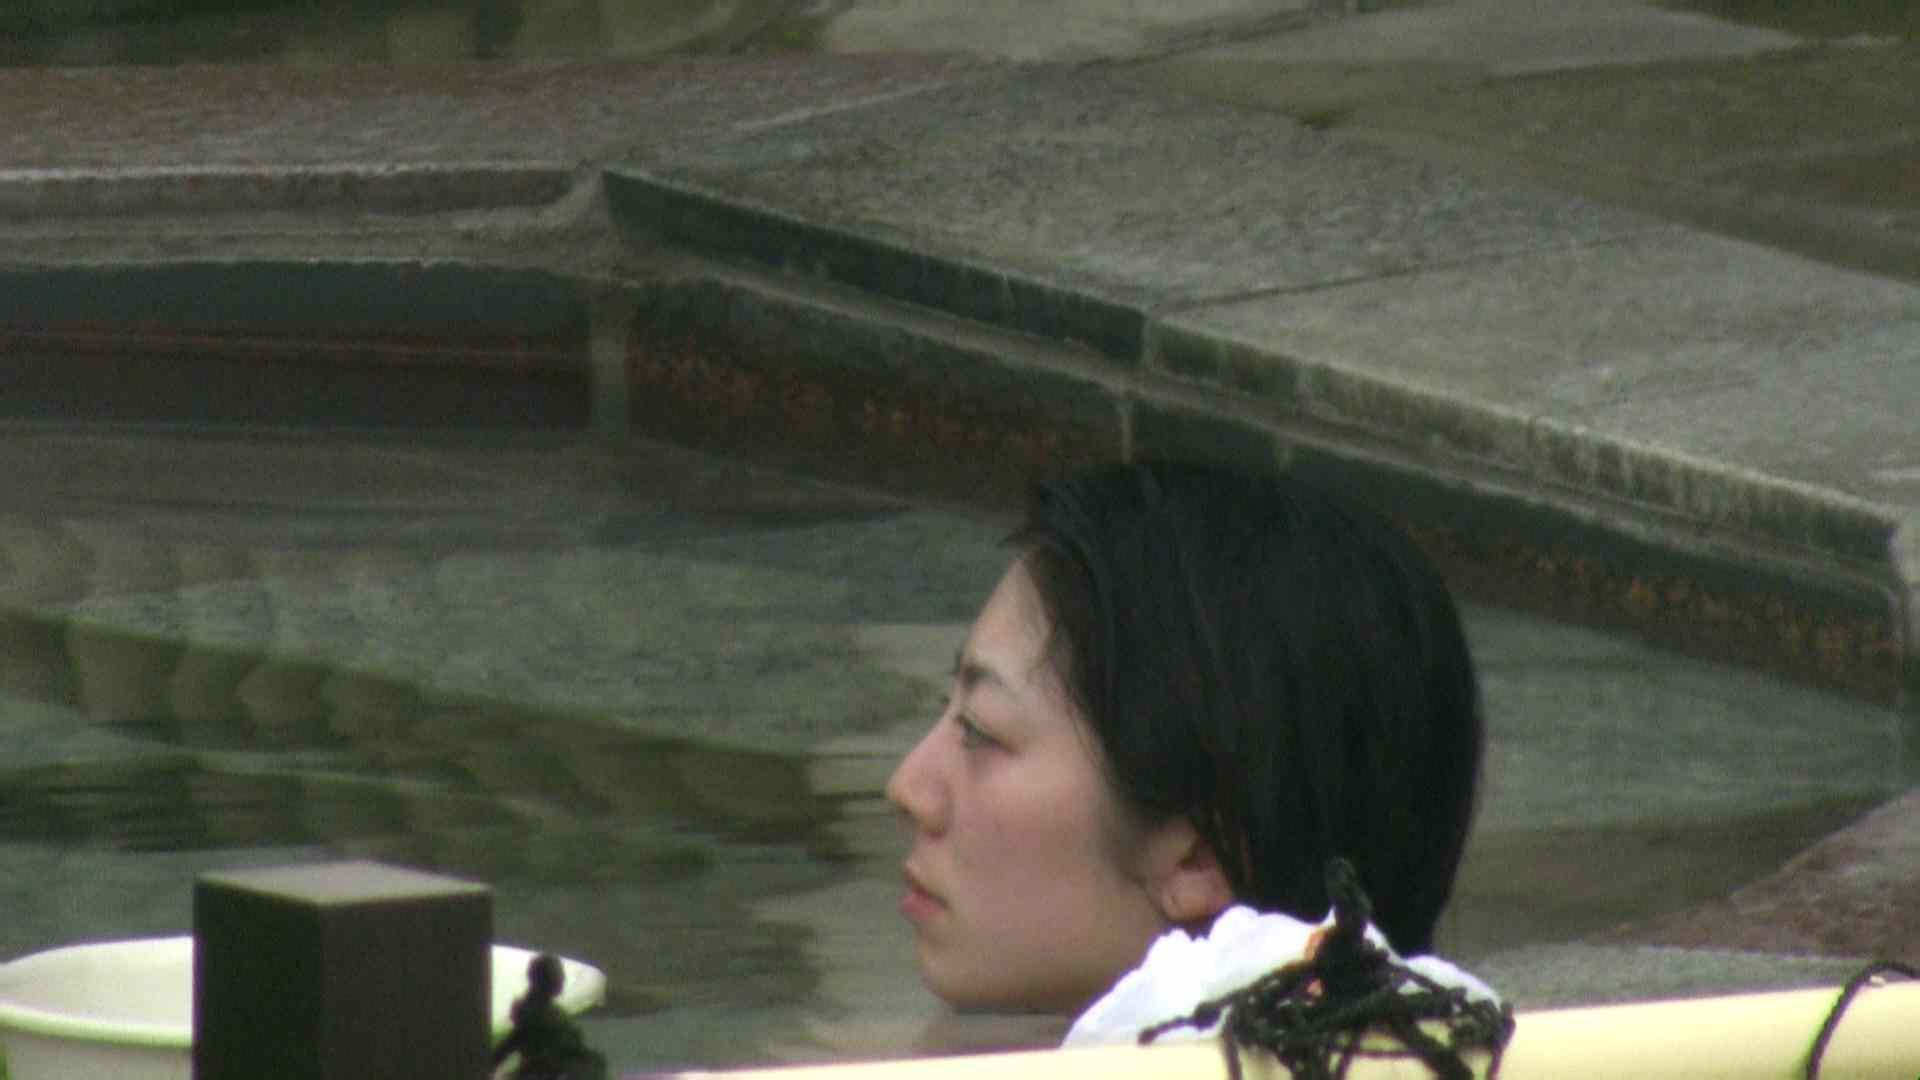 Aquaな露天風呂Vol.04 露天風呂編 | 盗撮シリーズ  94PIX 85